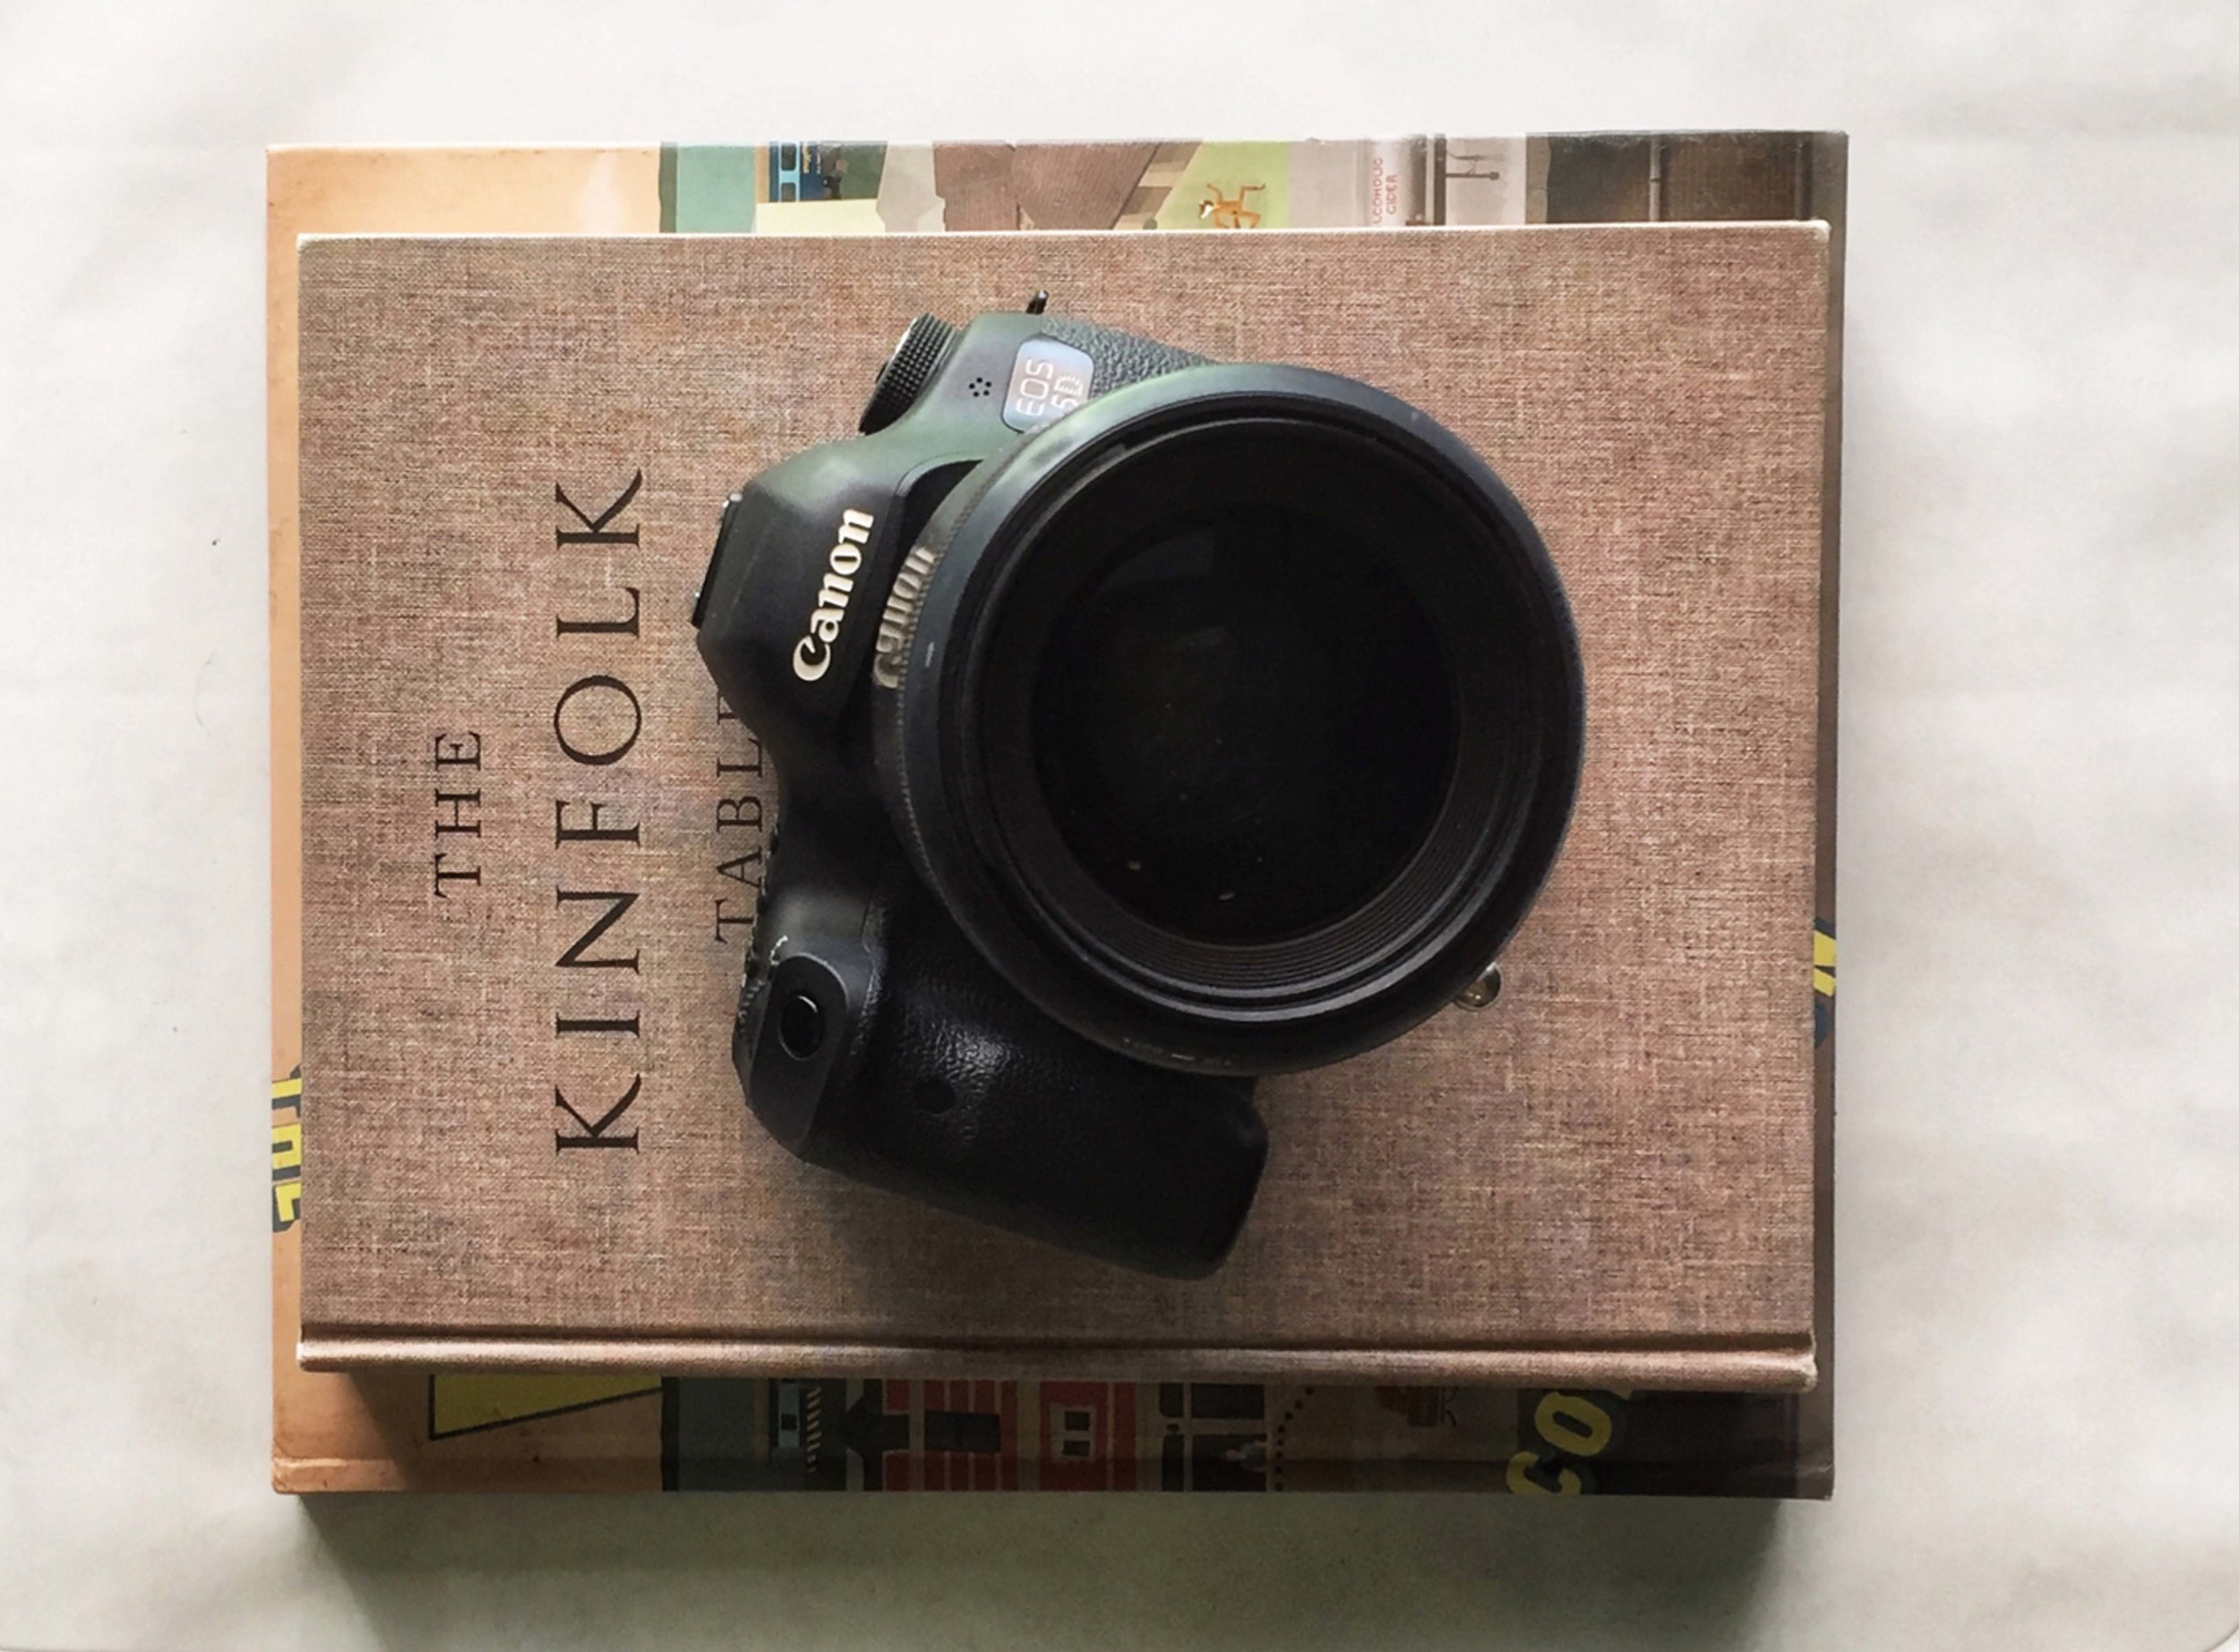 PHOTOGRAPHY TIPS! - Designed for the beginner